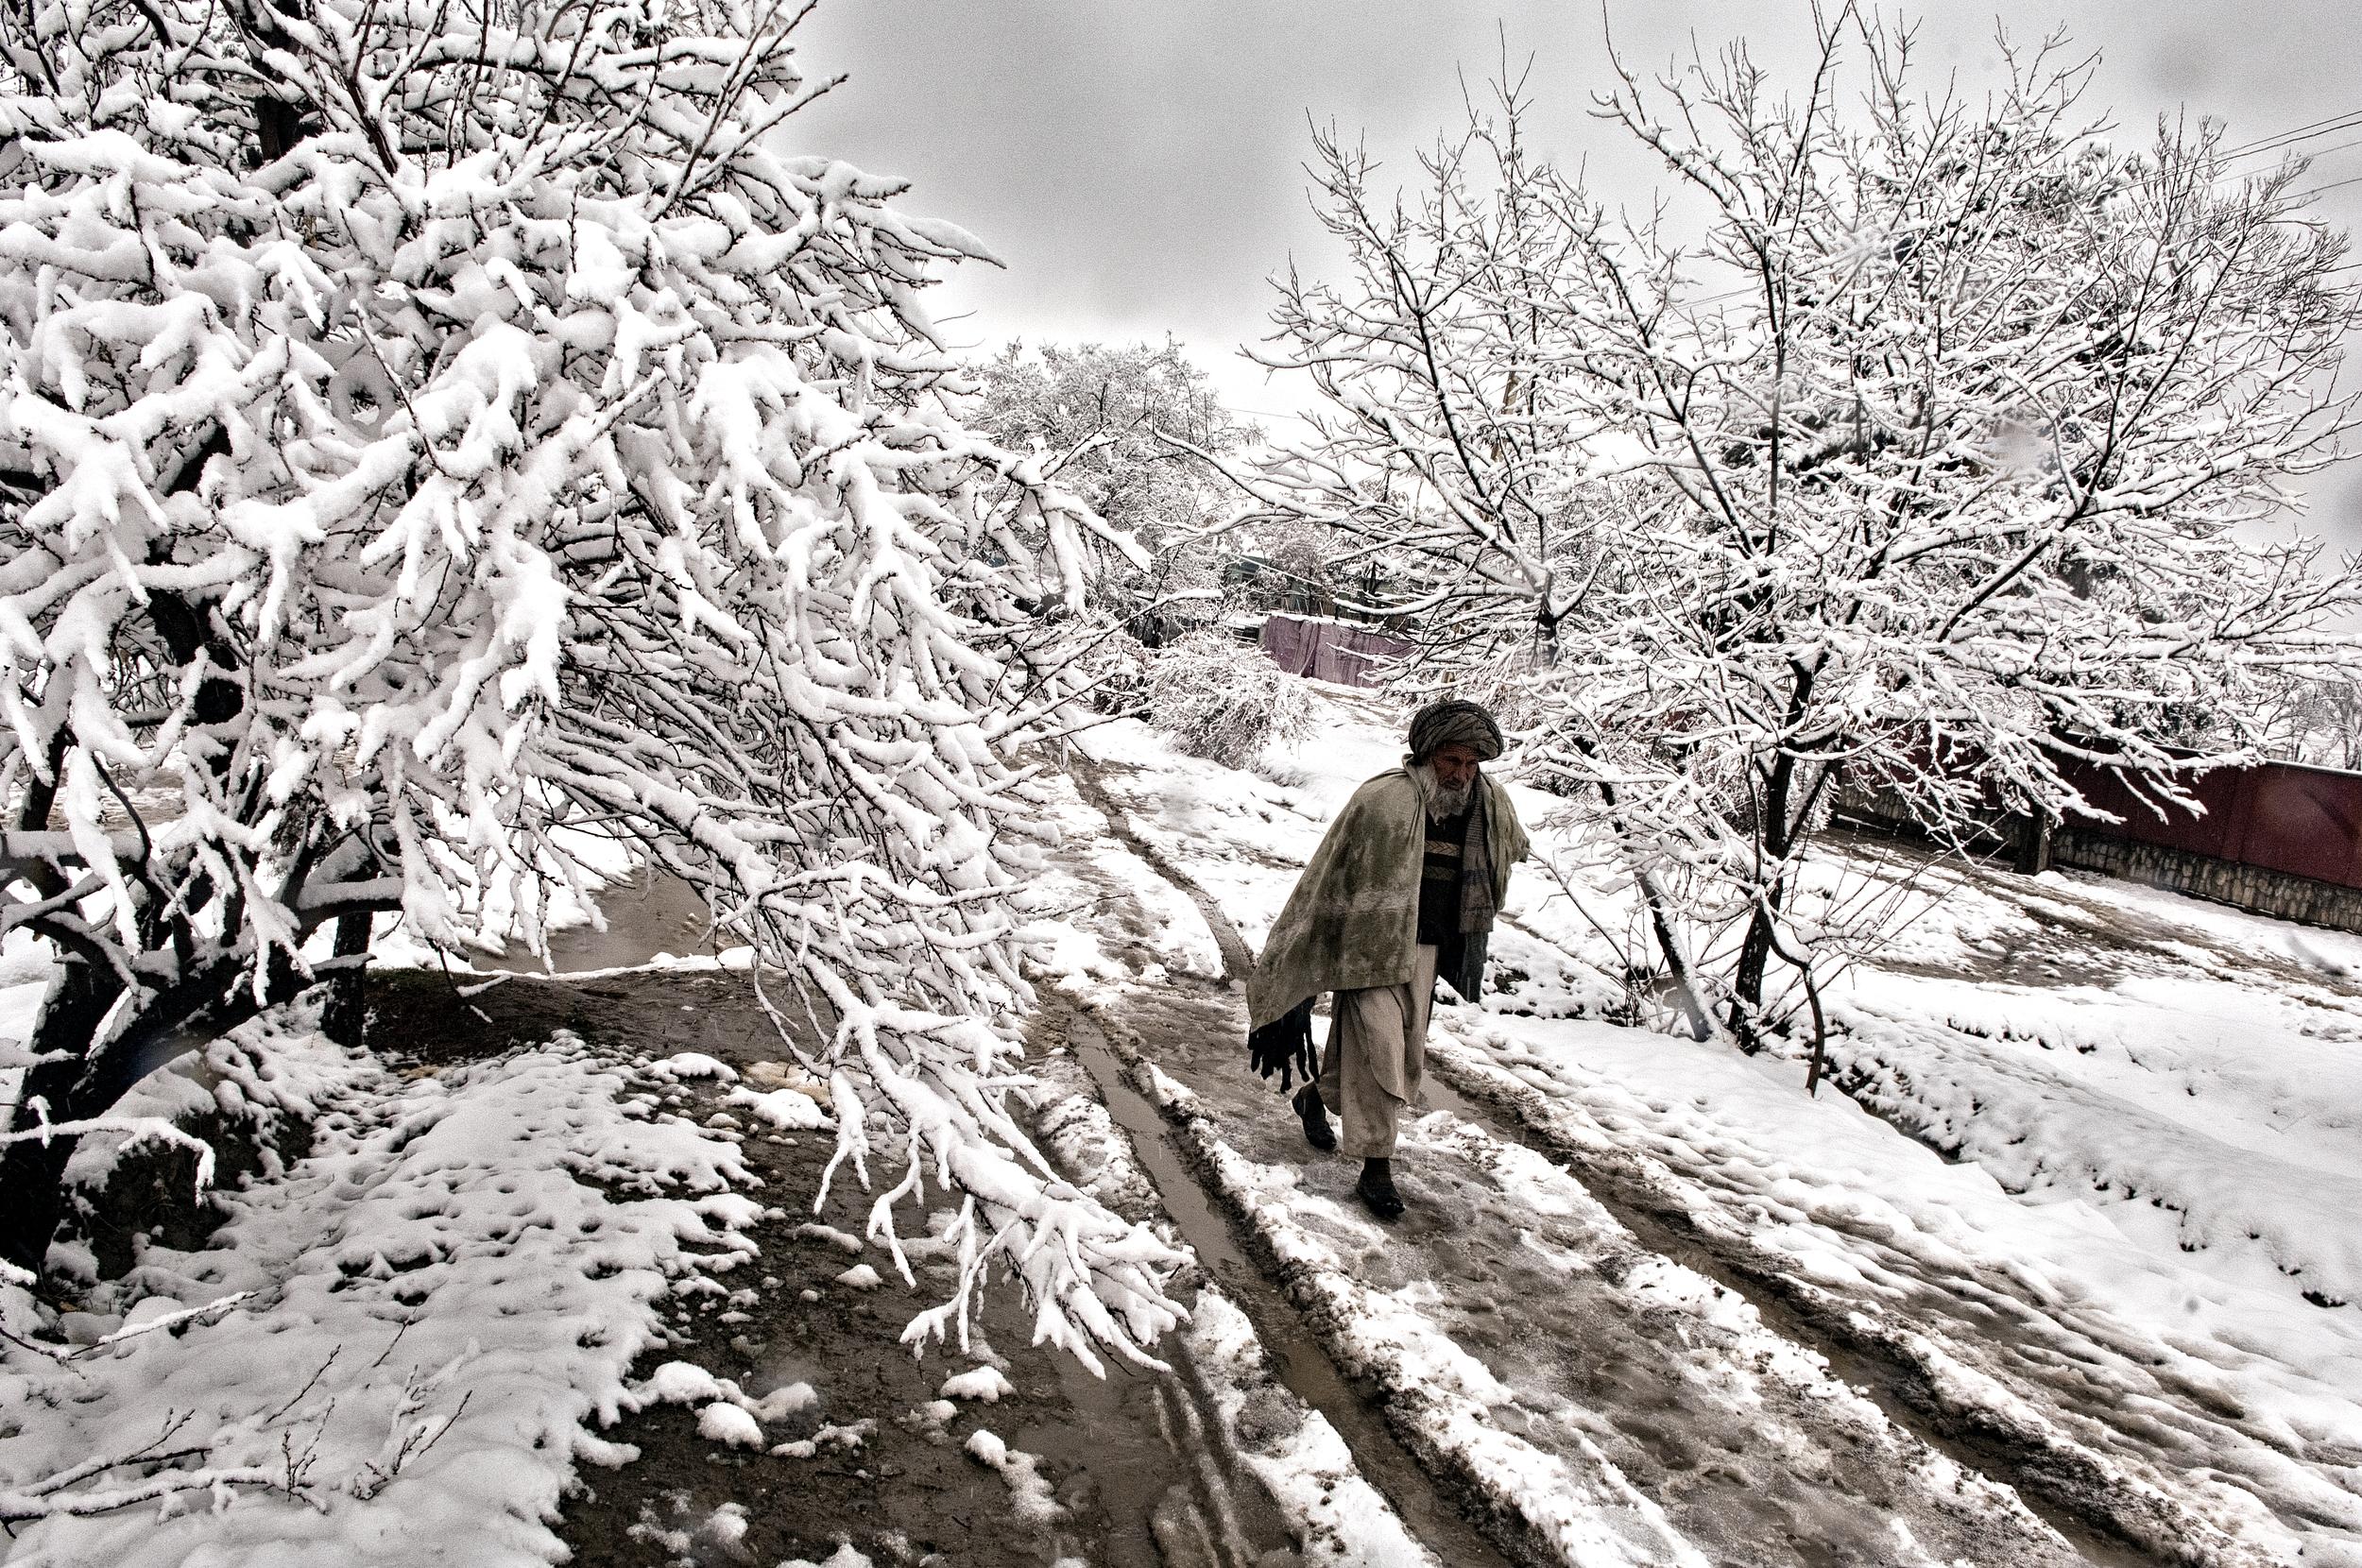 An elderly Afghan man walks through snow in Maymana, Faryab Province, Afghanistan, February 21, 2008. (Photo/Mark Pearson)